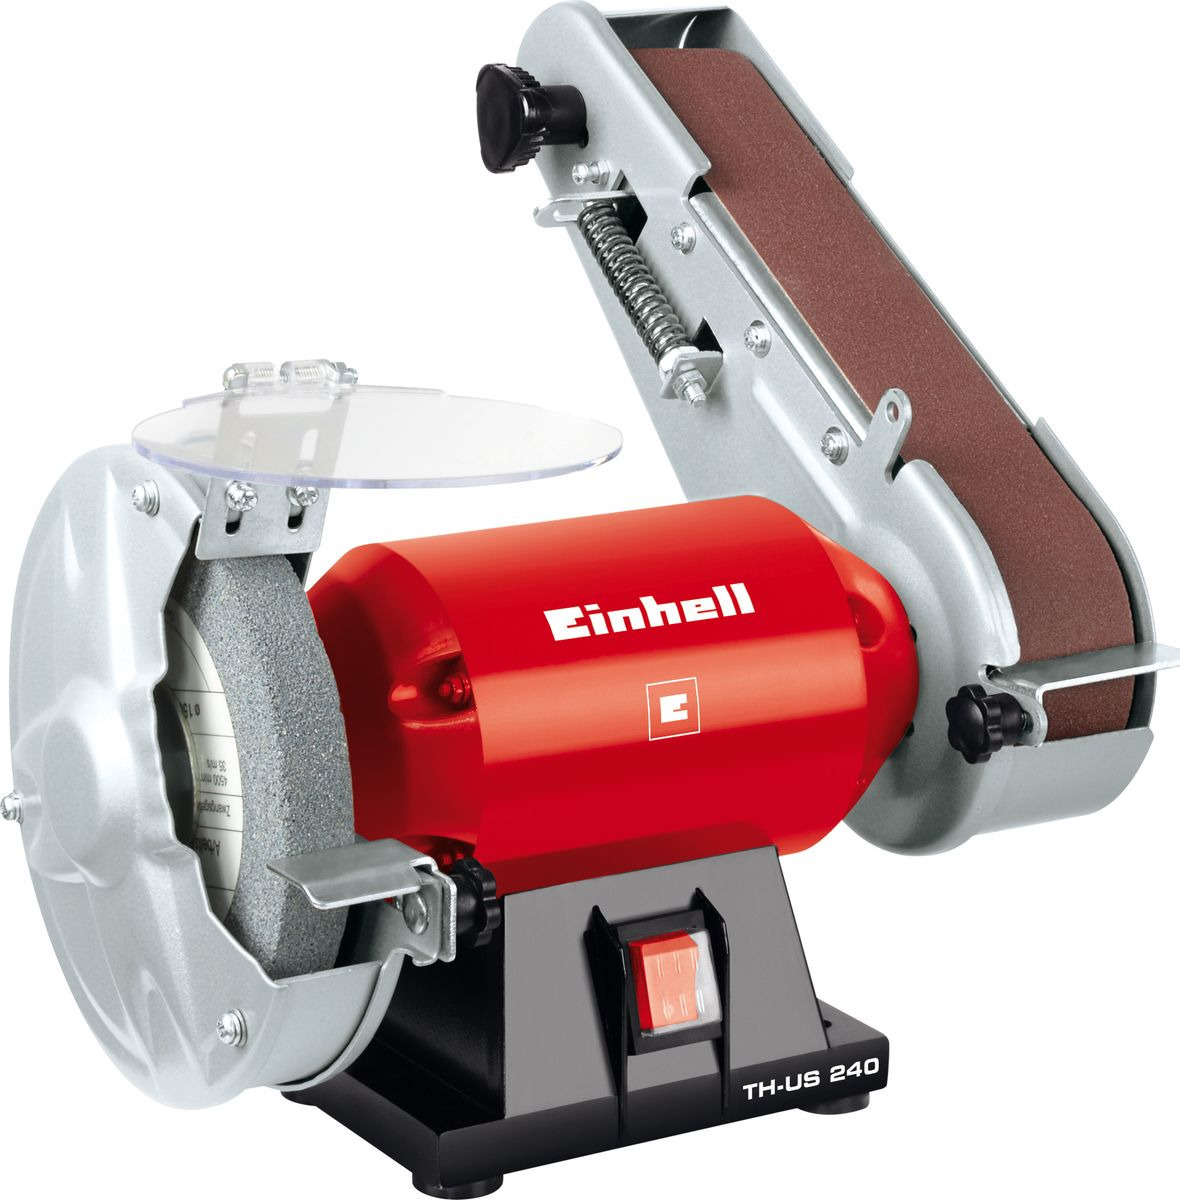 Станок точильный Einhell Classic TH-US 240, 240Вт, 2950 об/мин цена 2017